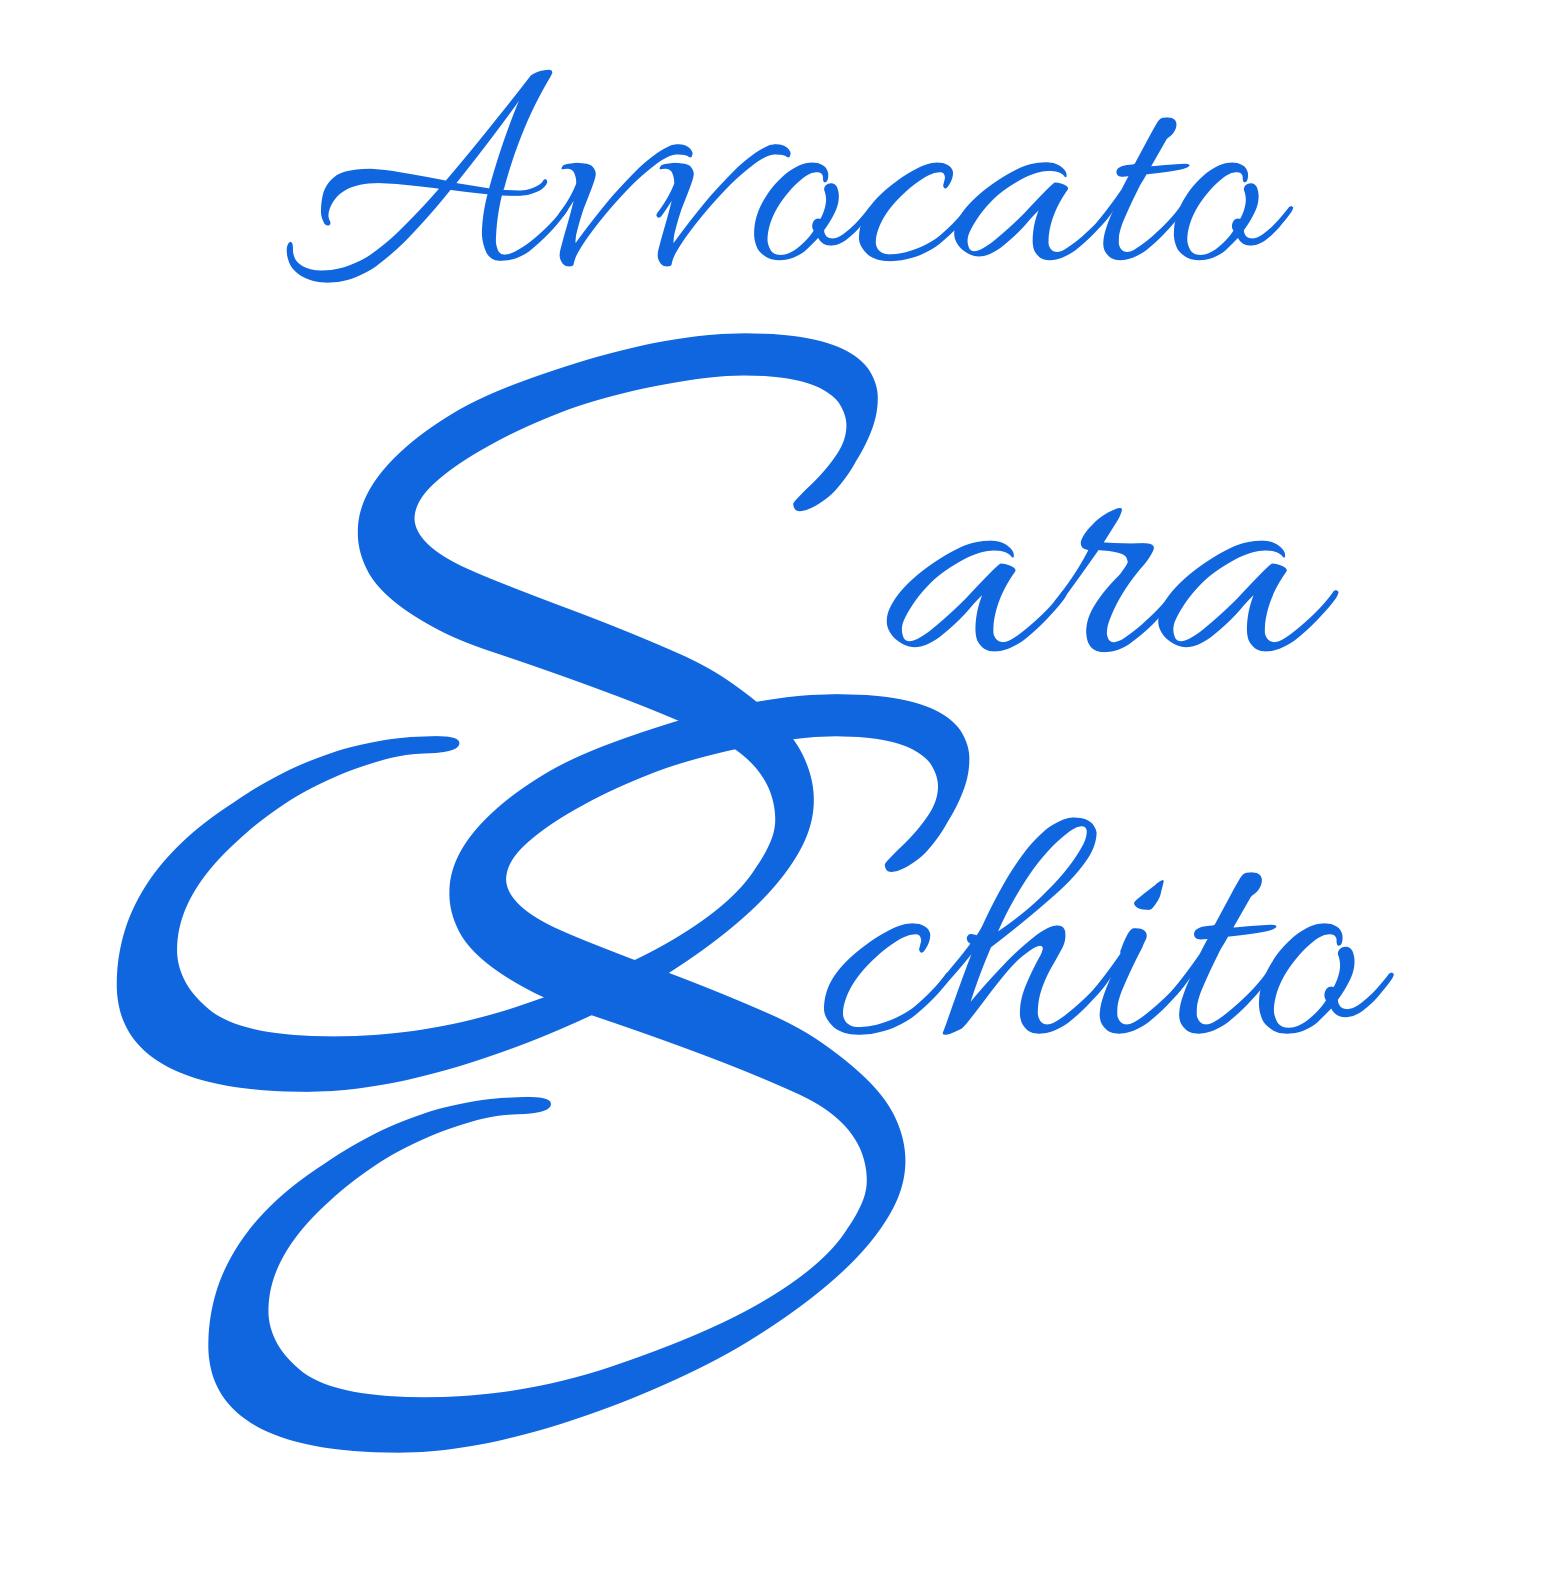 Avvocato Sara Schito